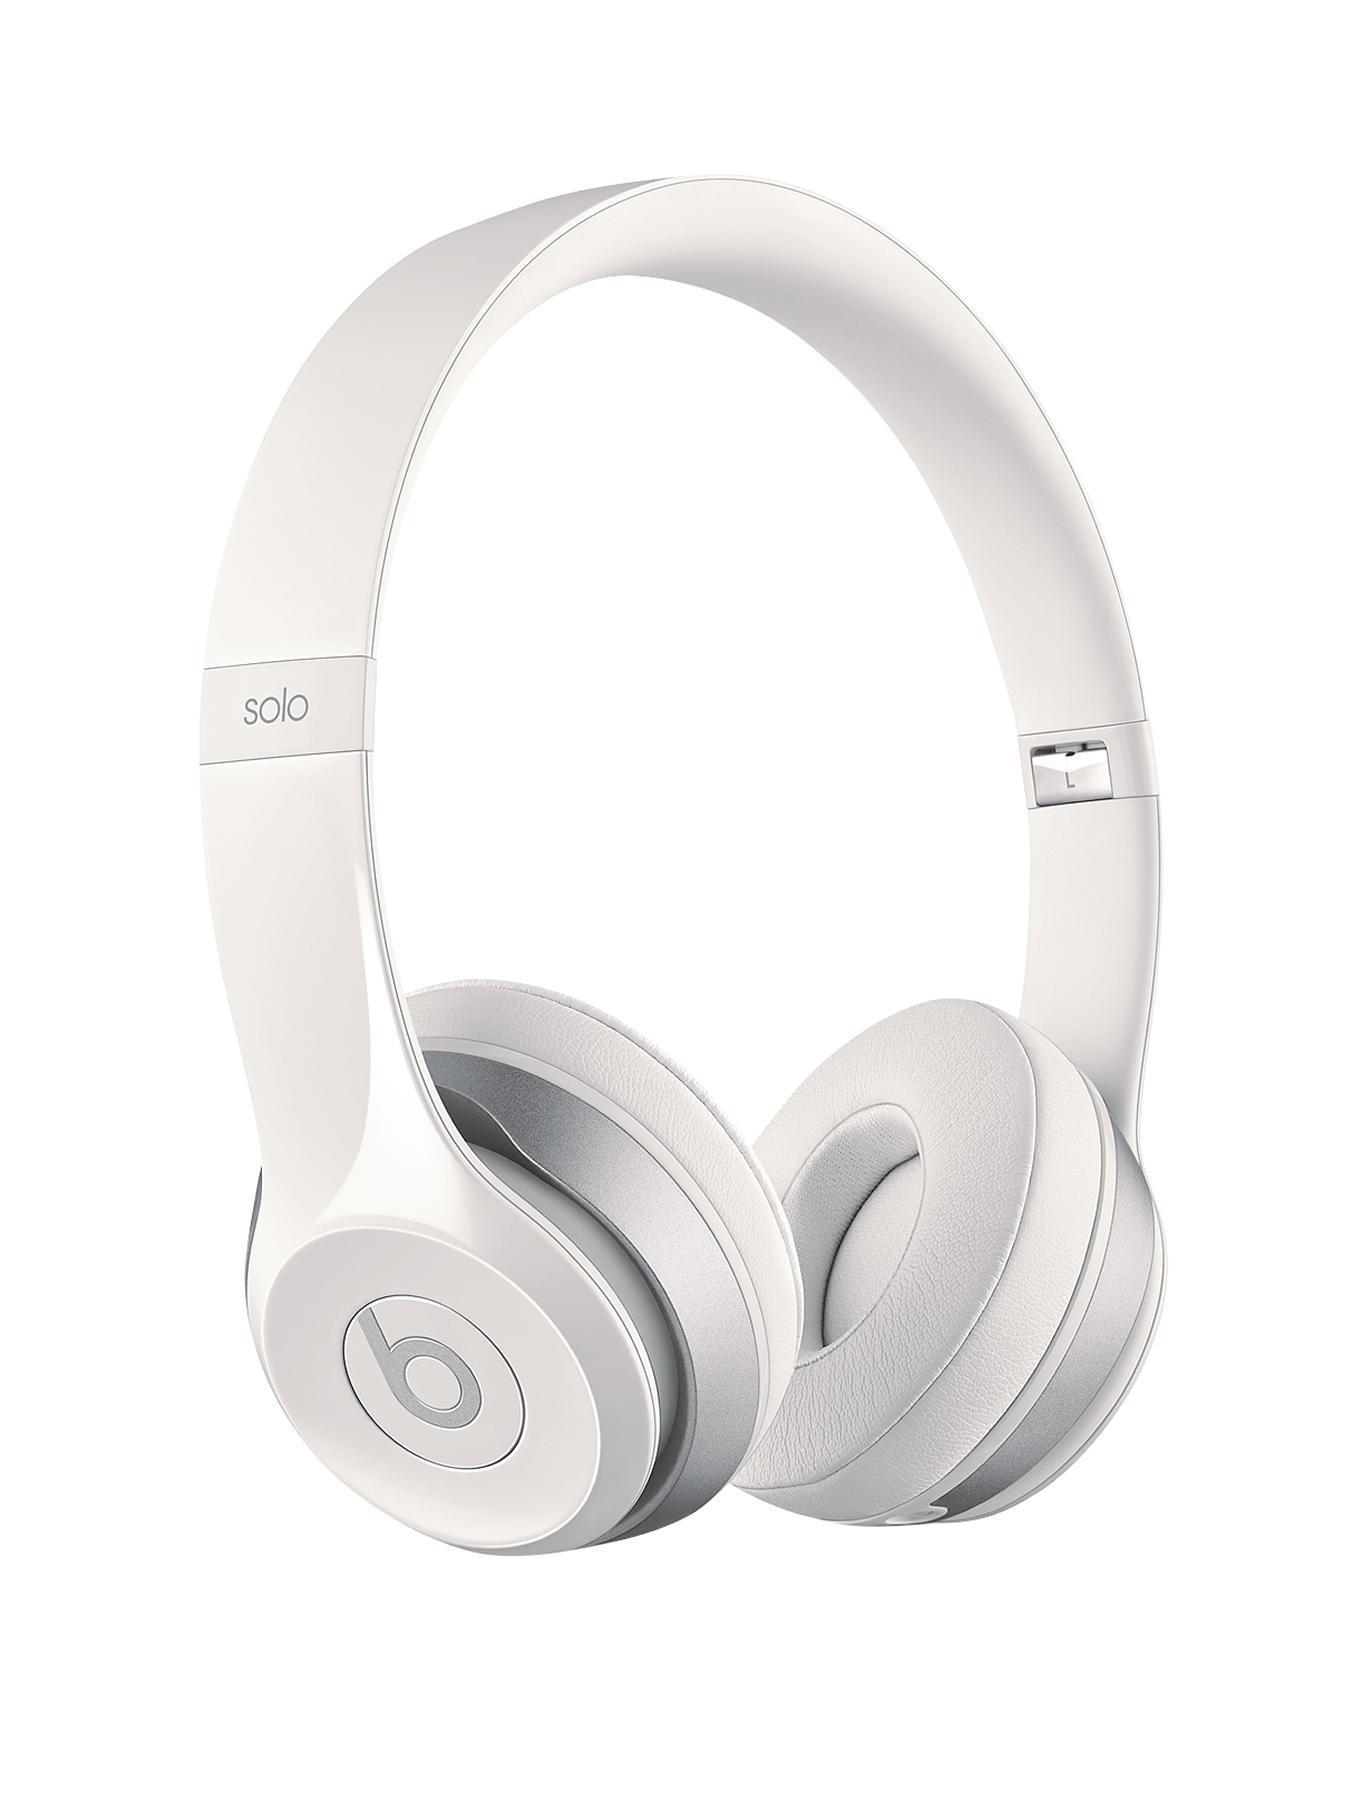 Beats by Dr Dre Solo2 On-Ear Headphones